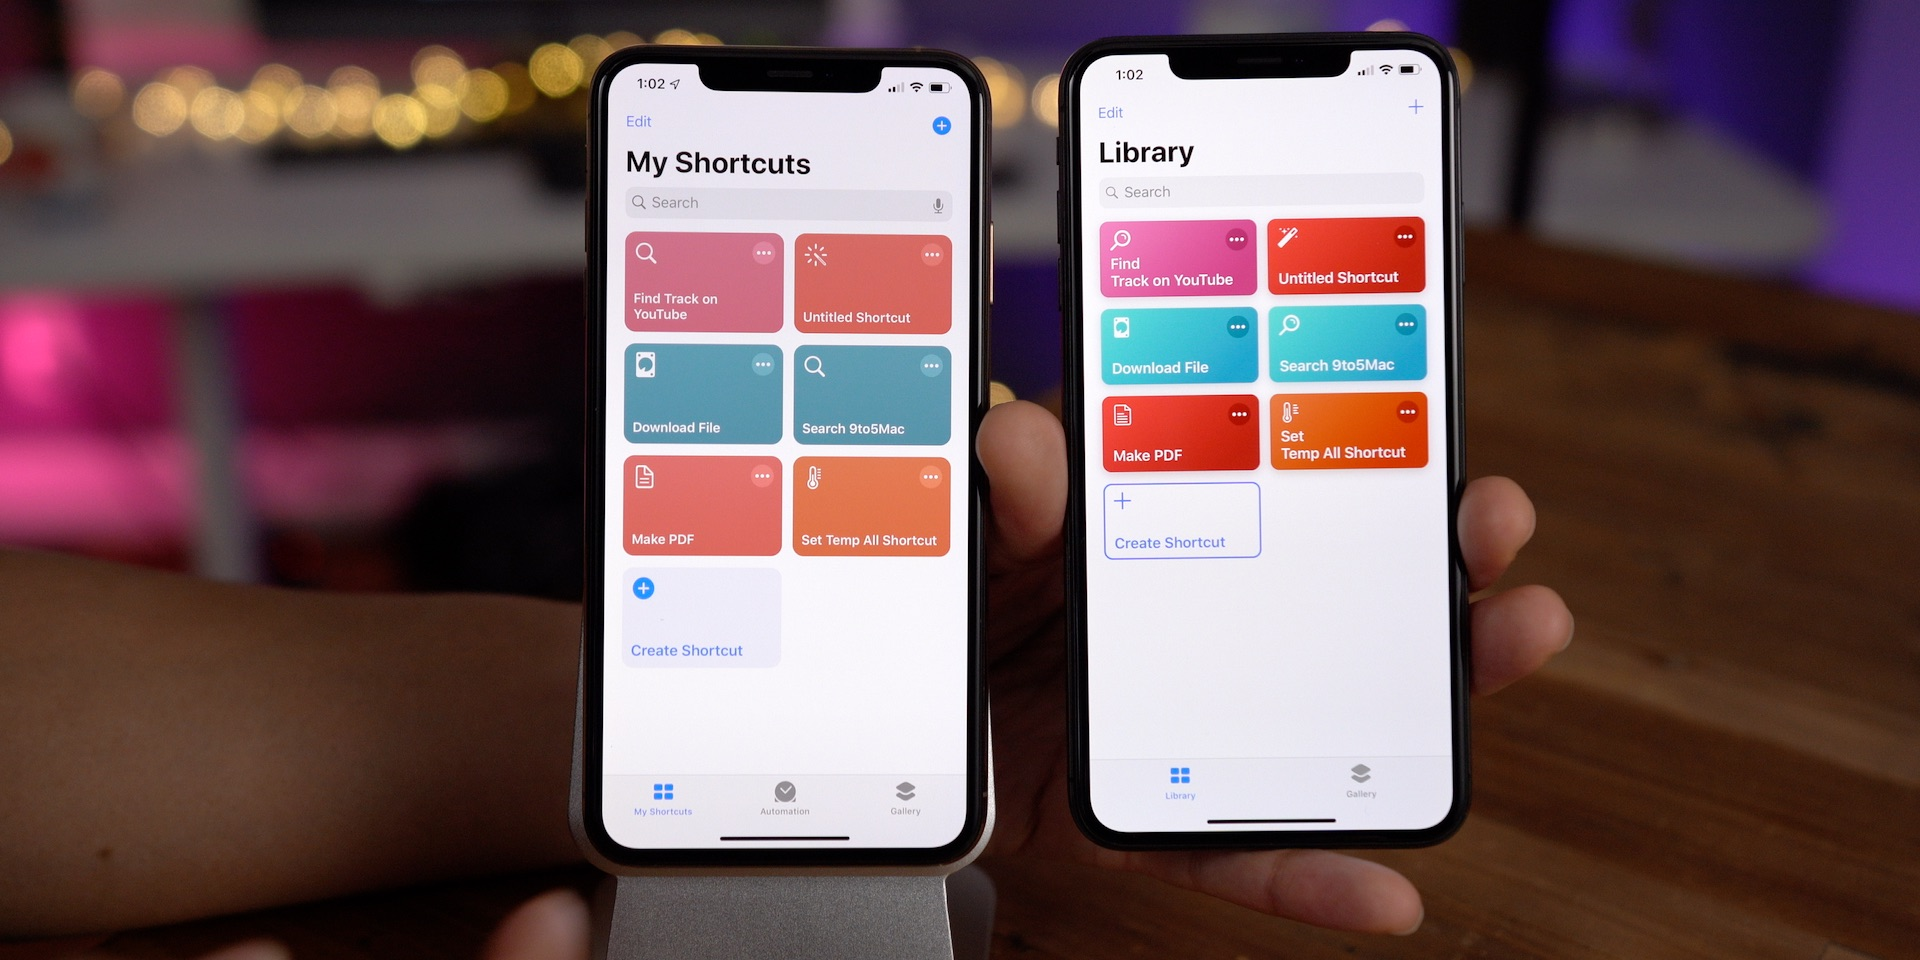 iOS 13 changes Shortcuts app